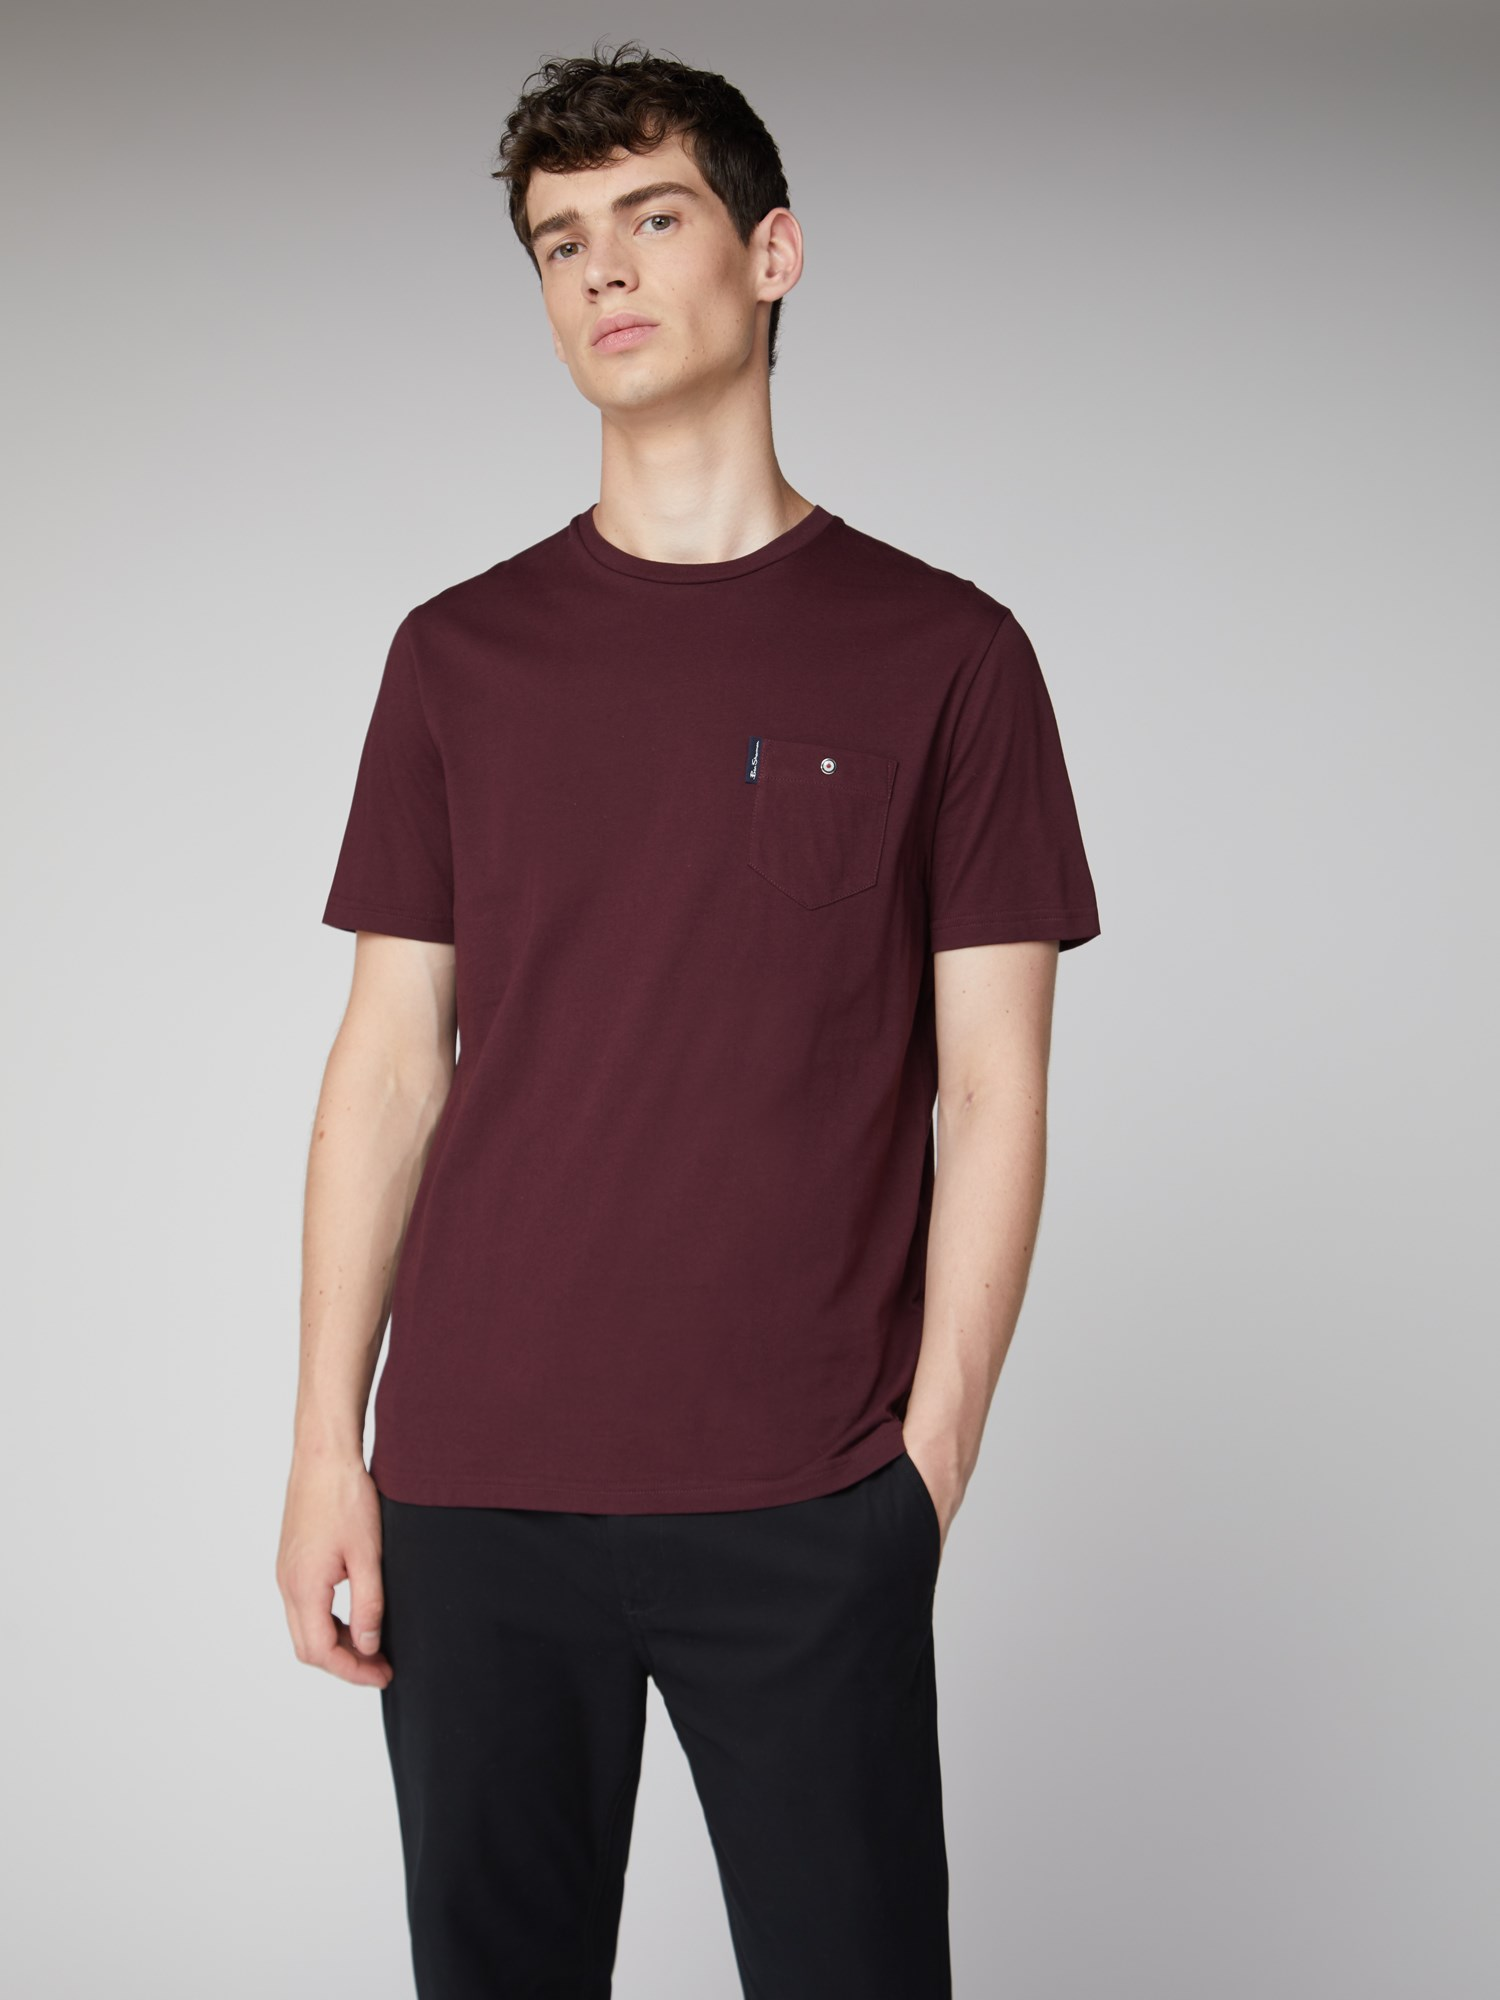 Ben Sherman Mens T-Shirt